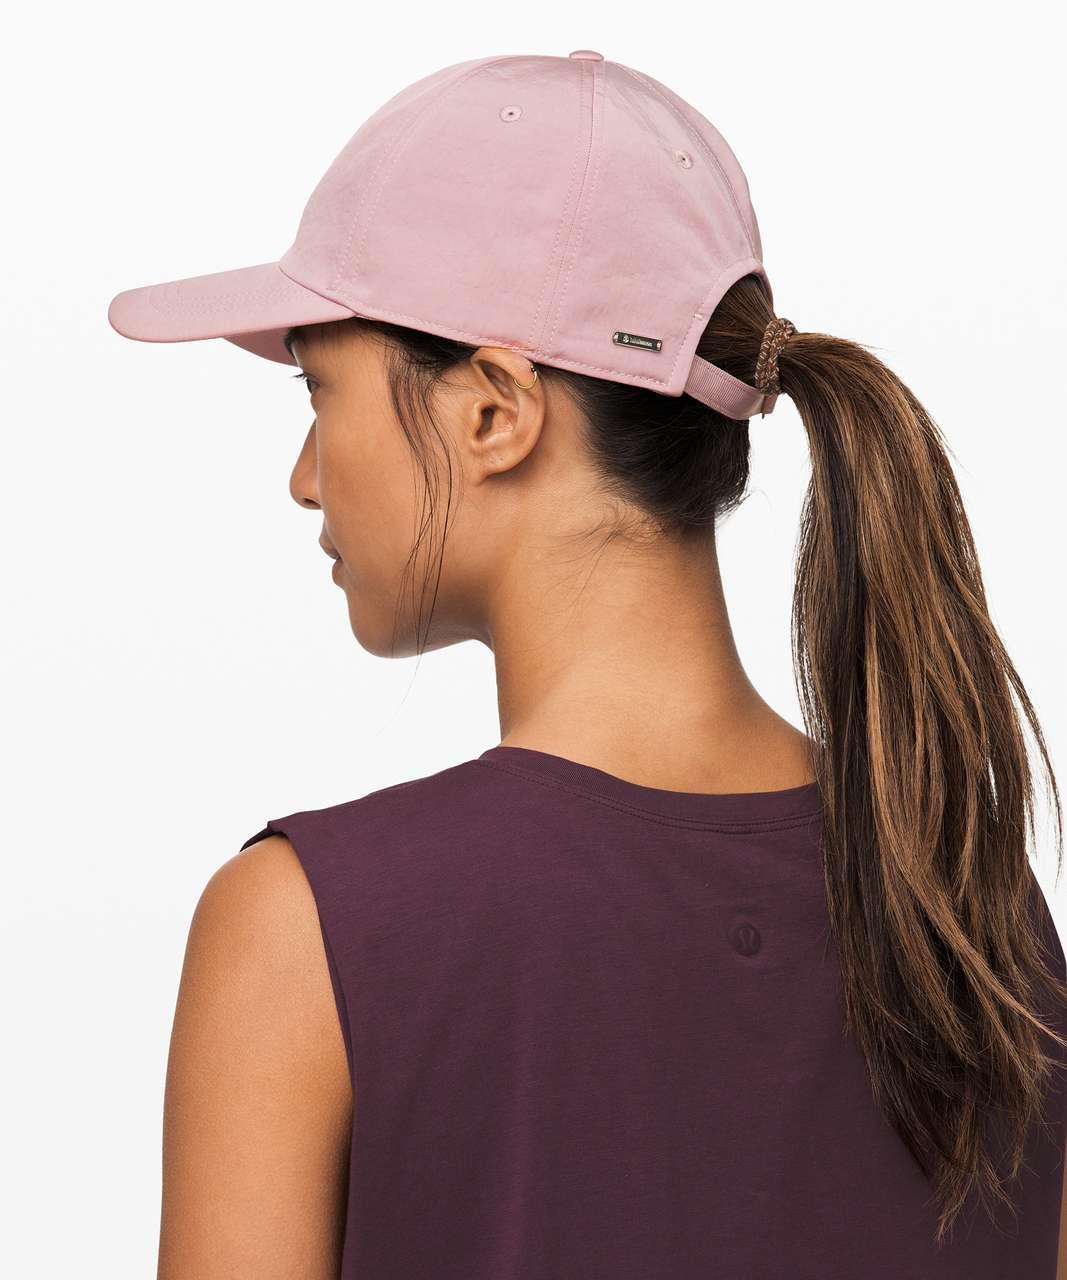 Lululemon Baller Hat II *Soft - Smoky Blush